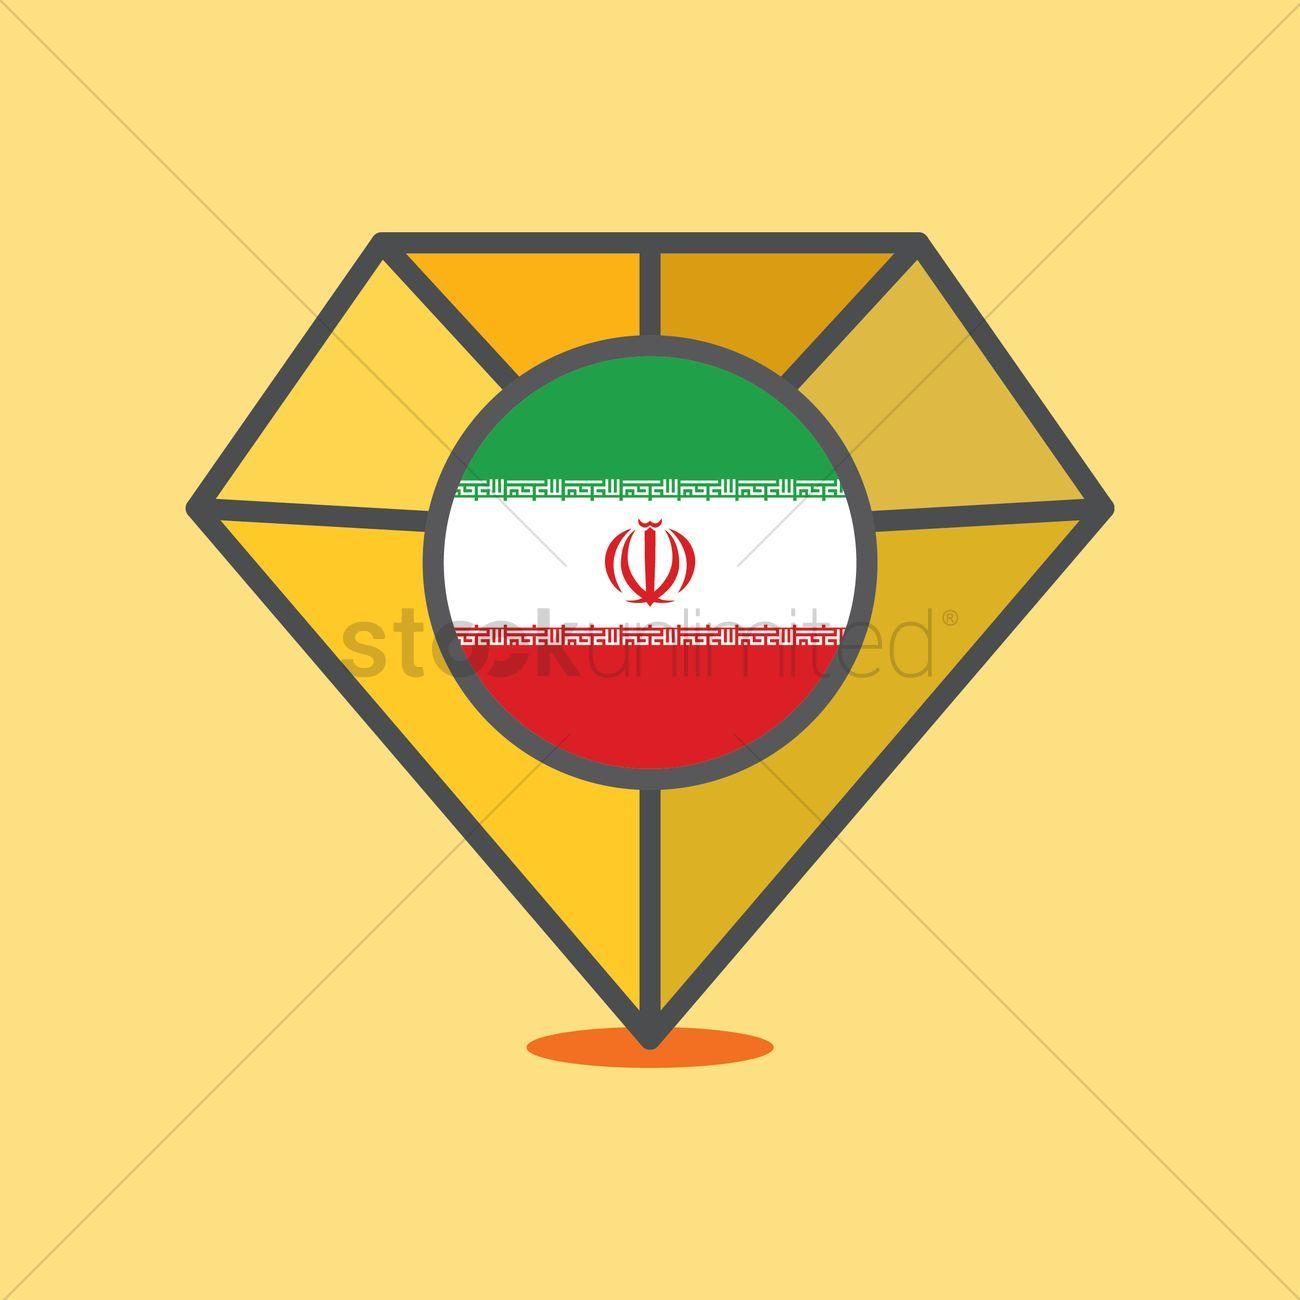 Iran flag on diamond stock vector , #affiliate, #flag, #Iran, #diamond, #vector, #stock #affiliate